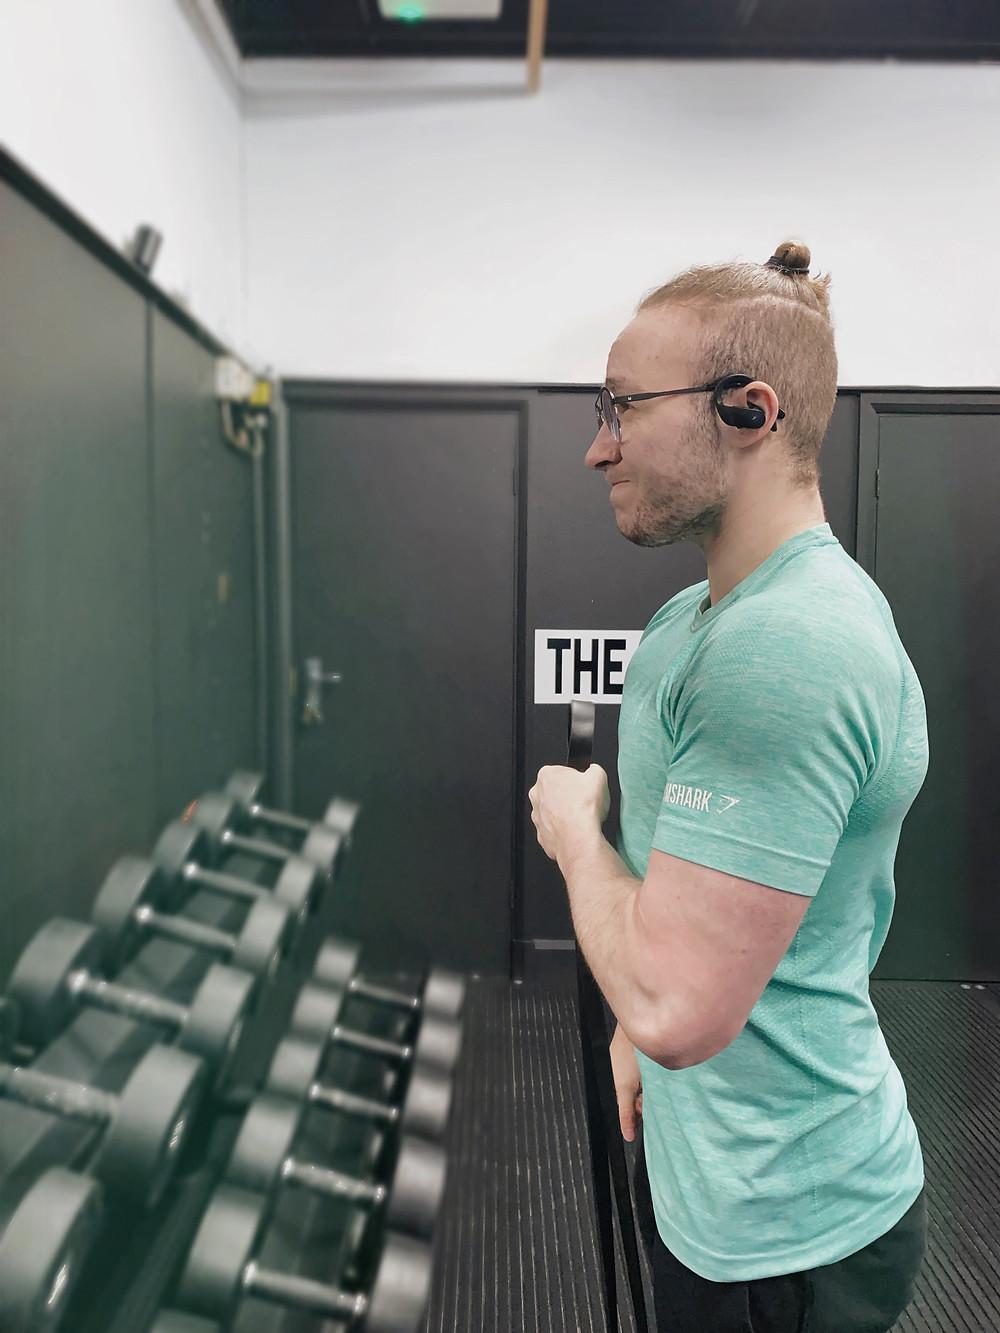 Sam Barnes Lifestyle ftm online personal trainer